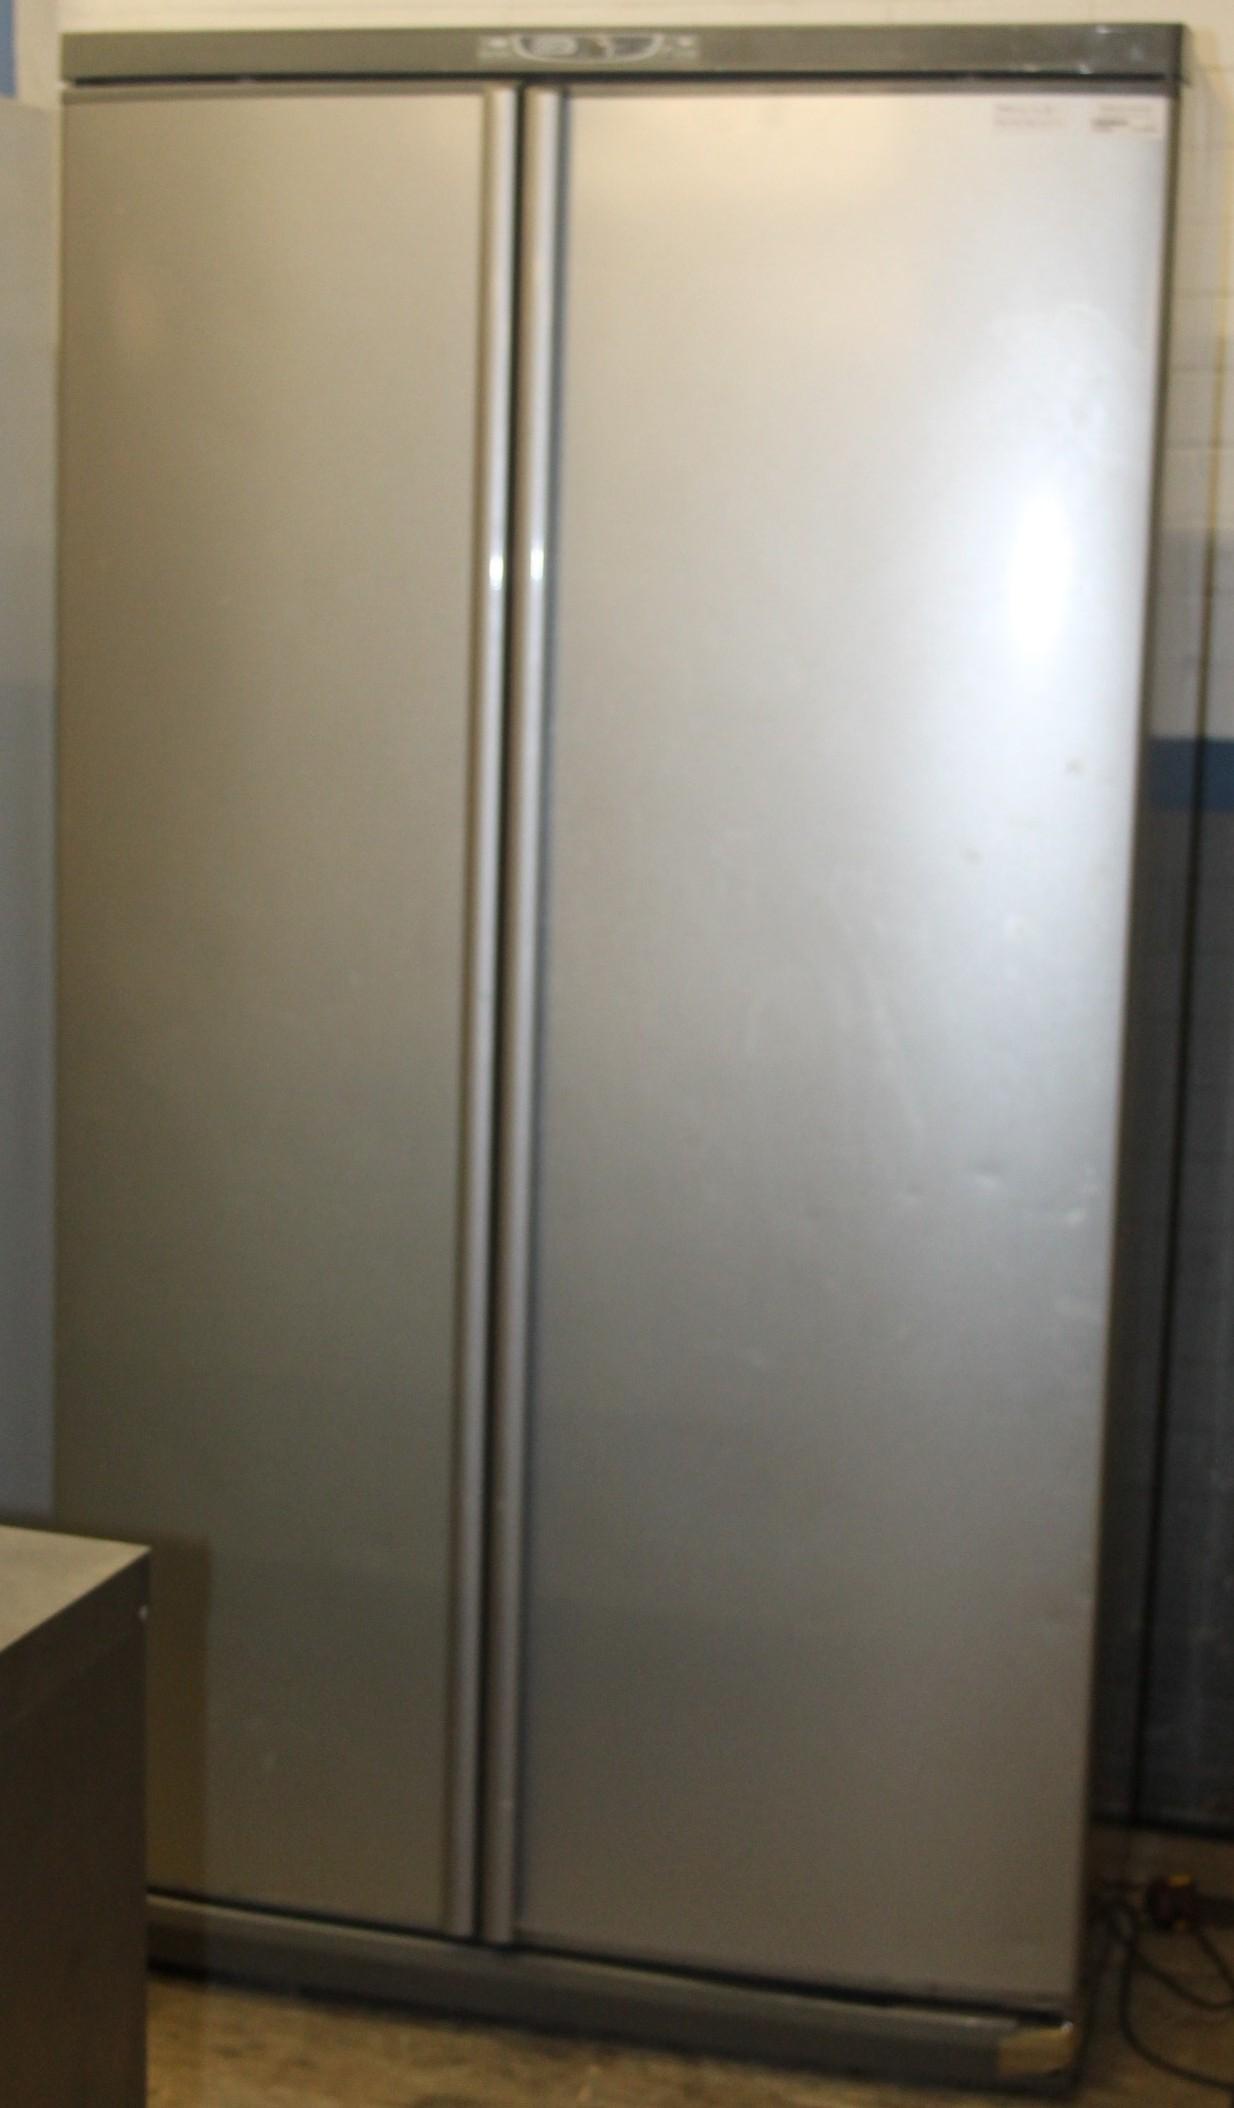 Defy fridge S028426b #Rosettenvillepawnshop